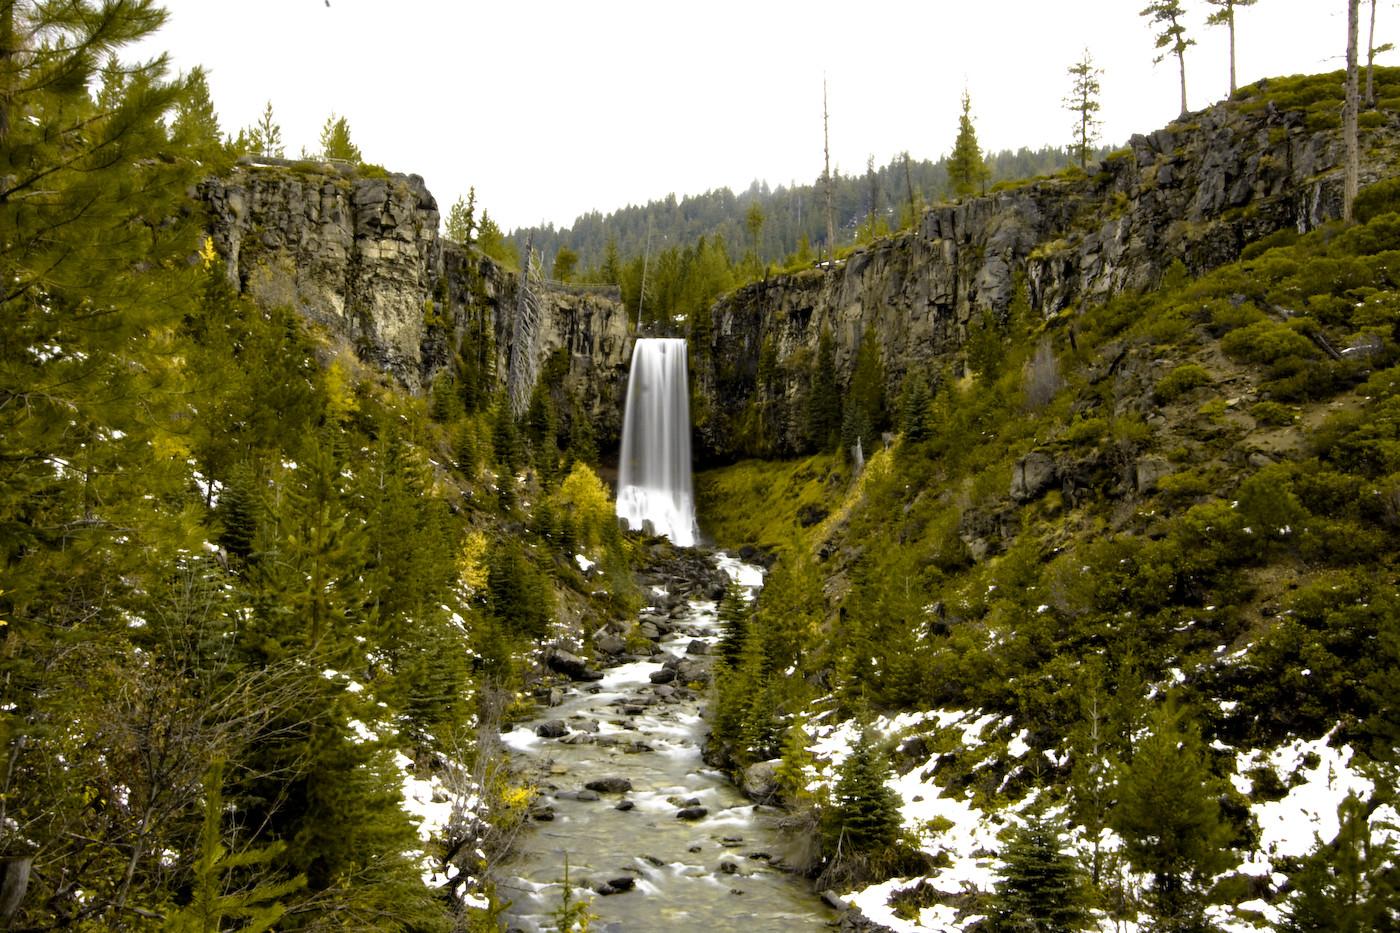 Tumalo Falls Hike near Bend Oregon near Redmond Oregon